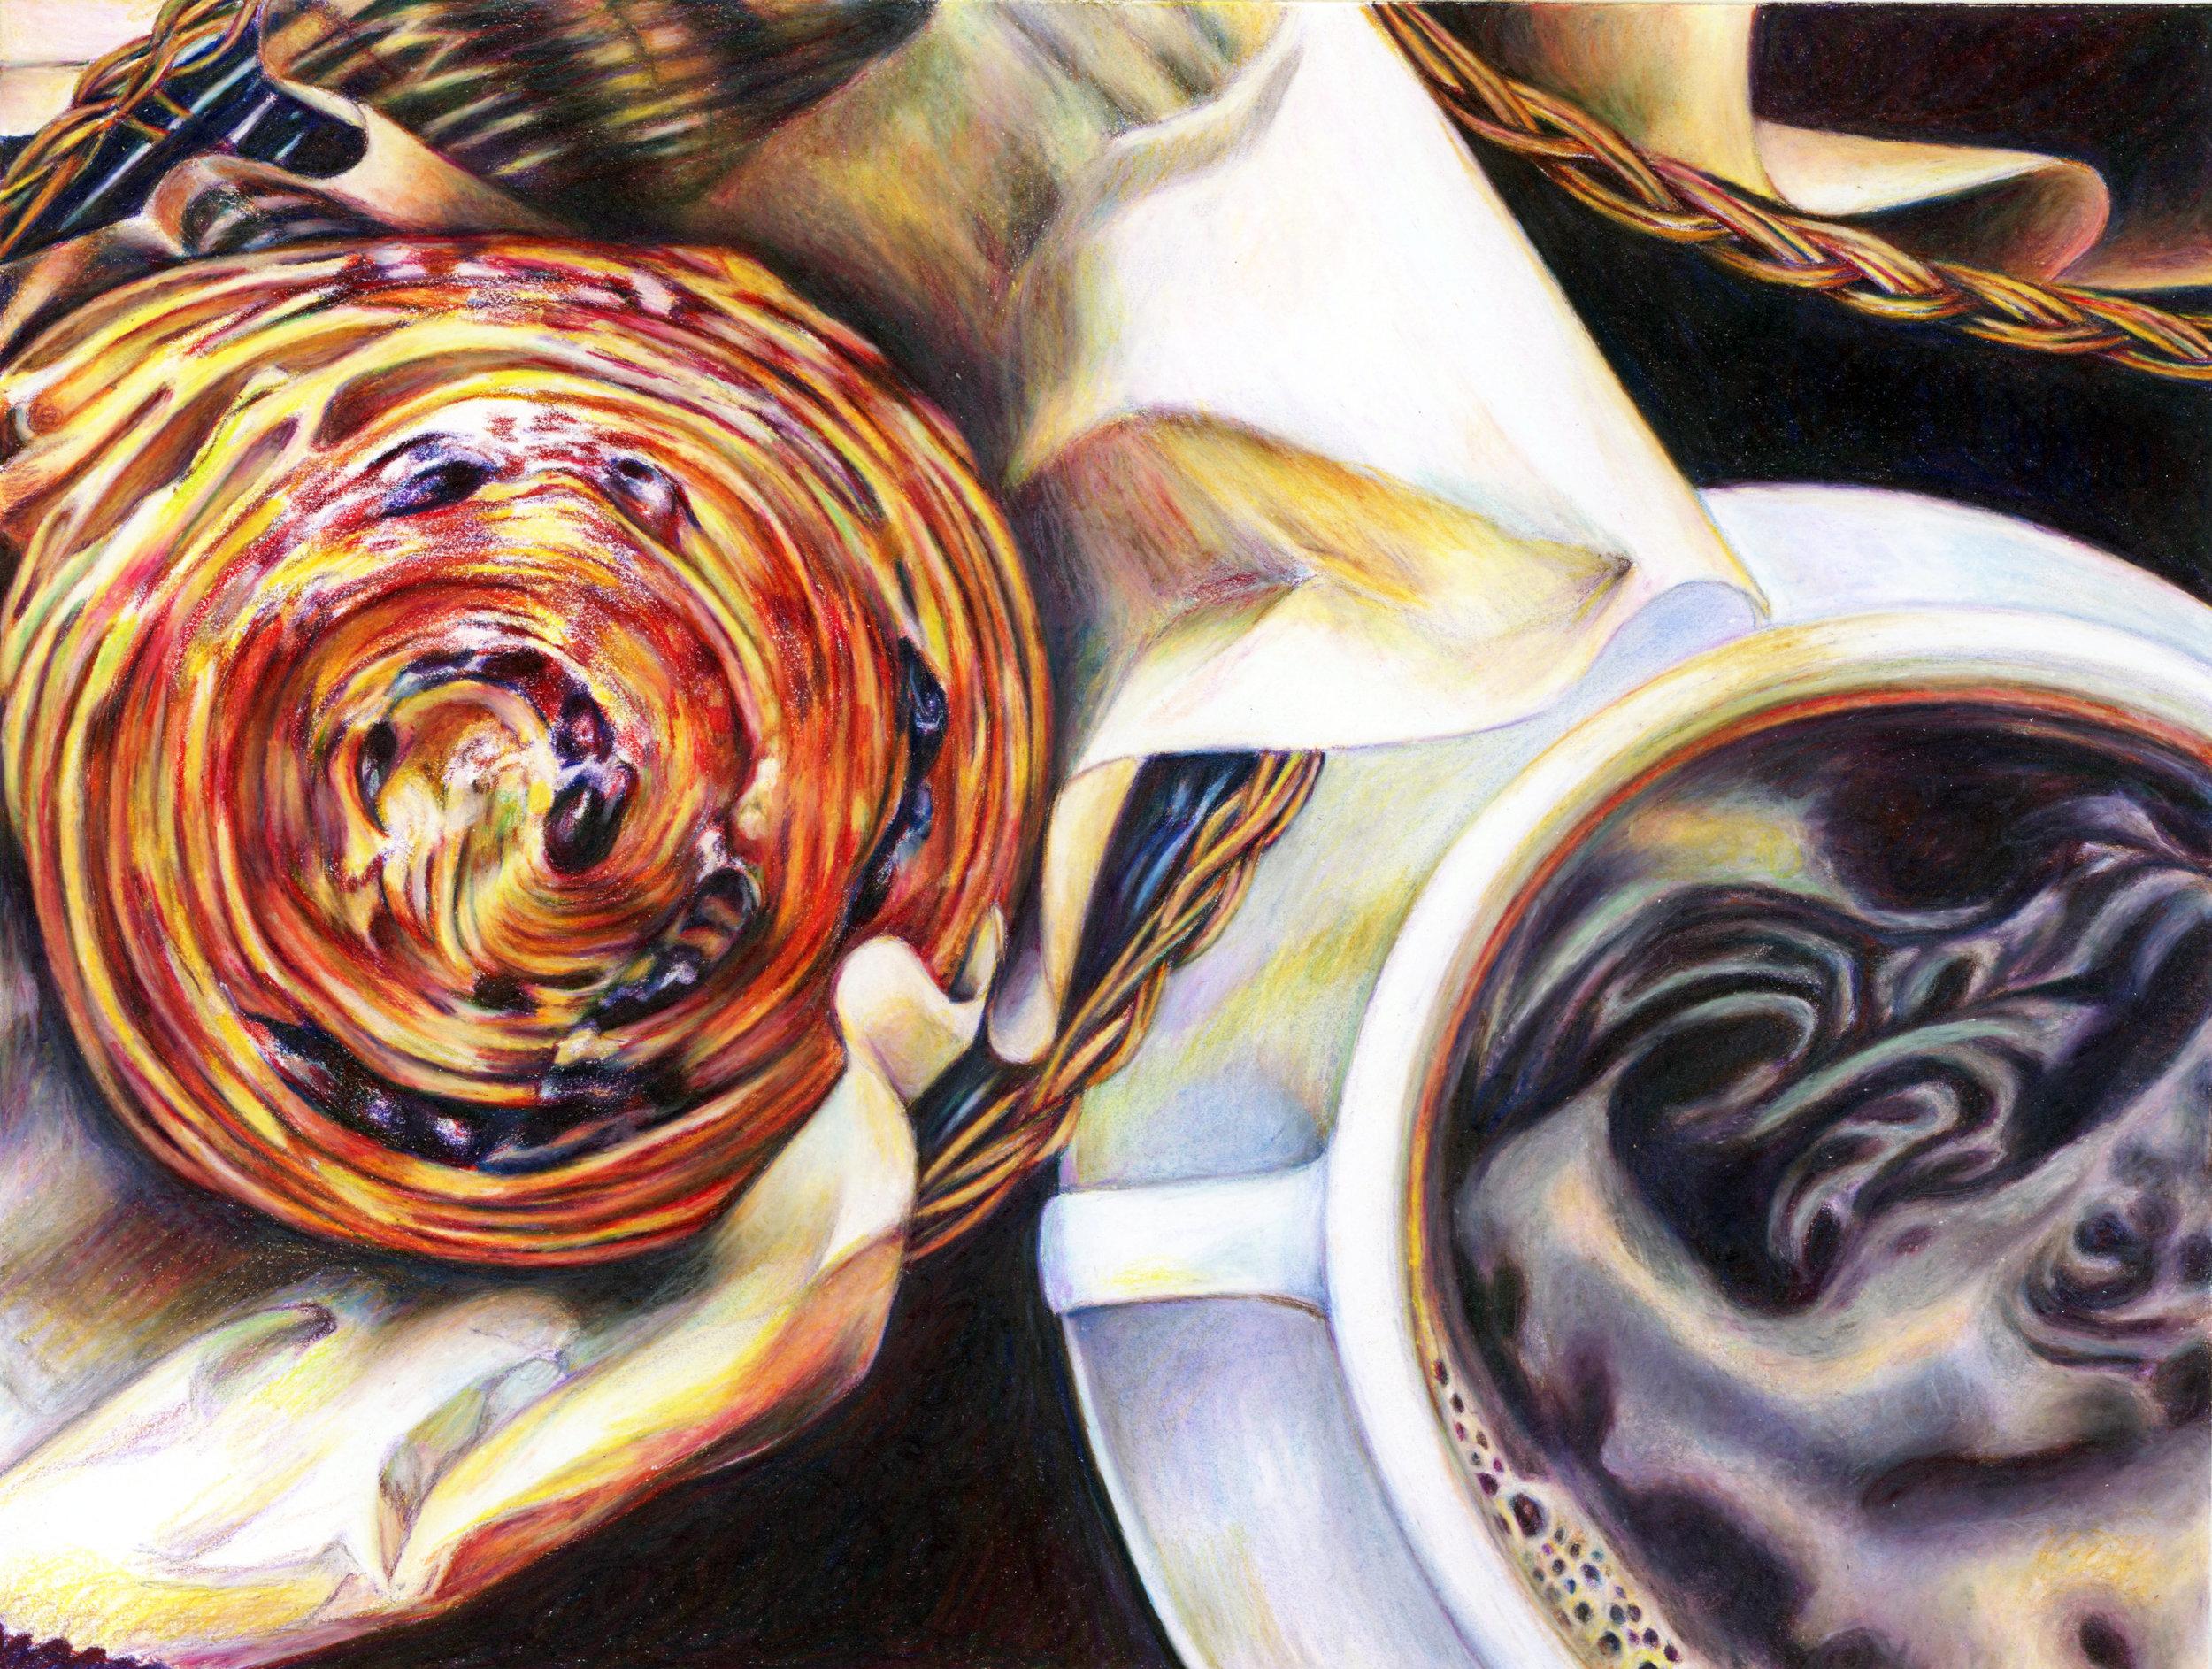 Rasincroissantandcoffee.jpg